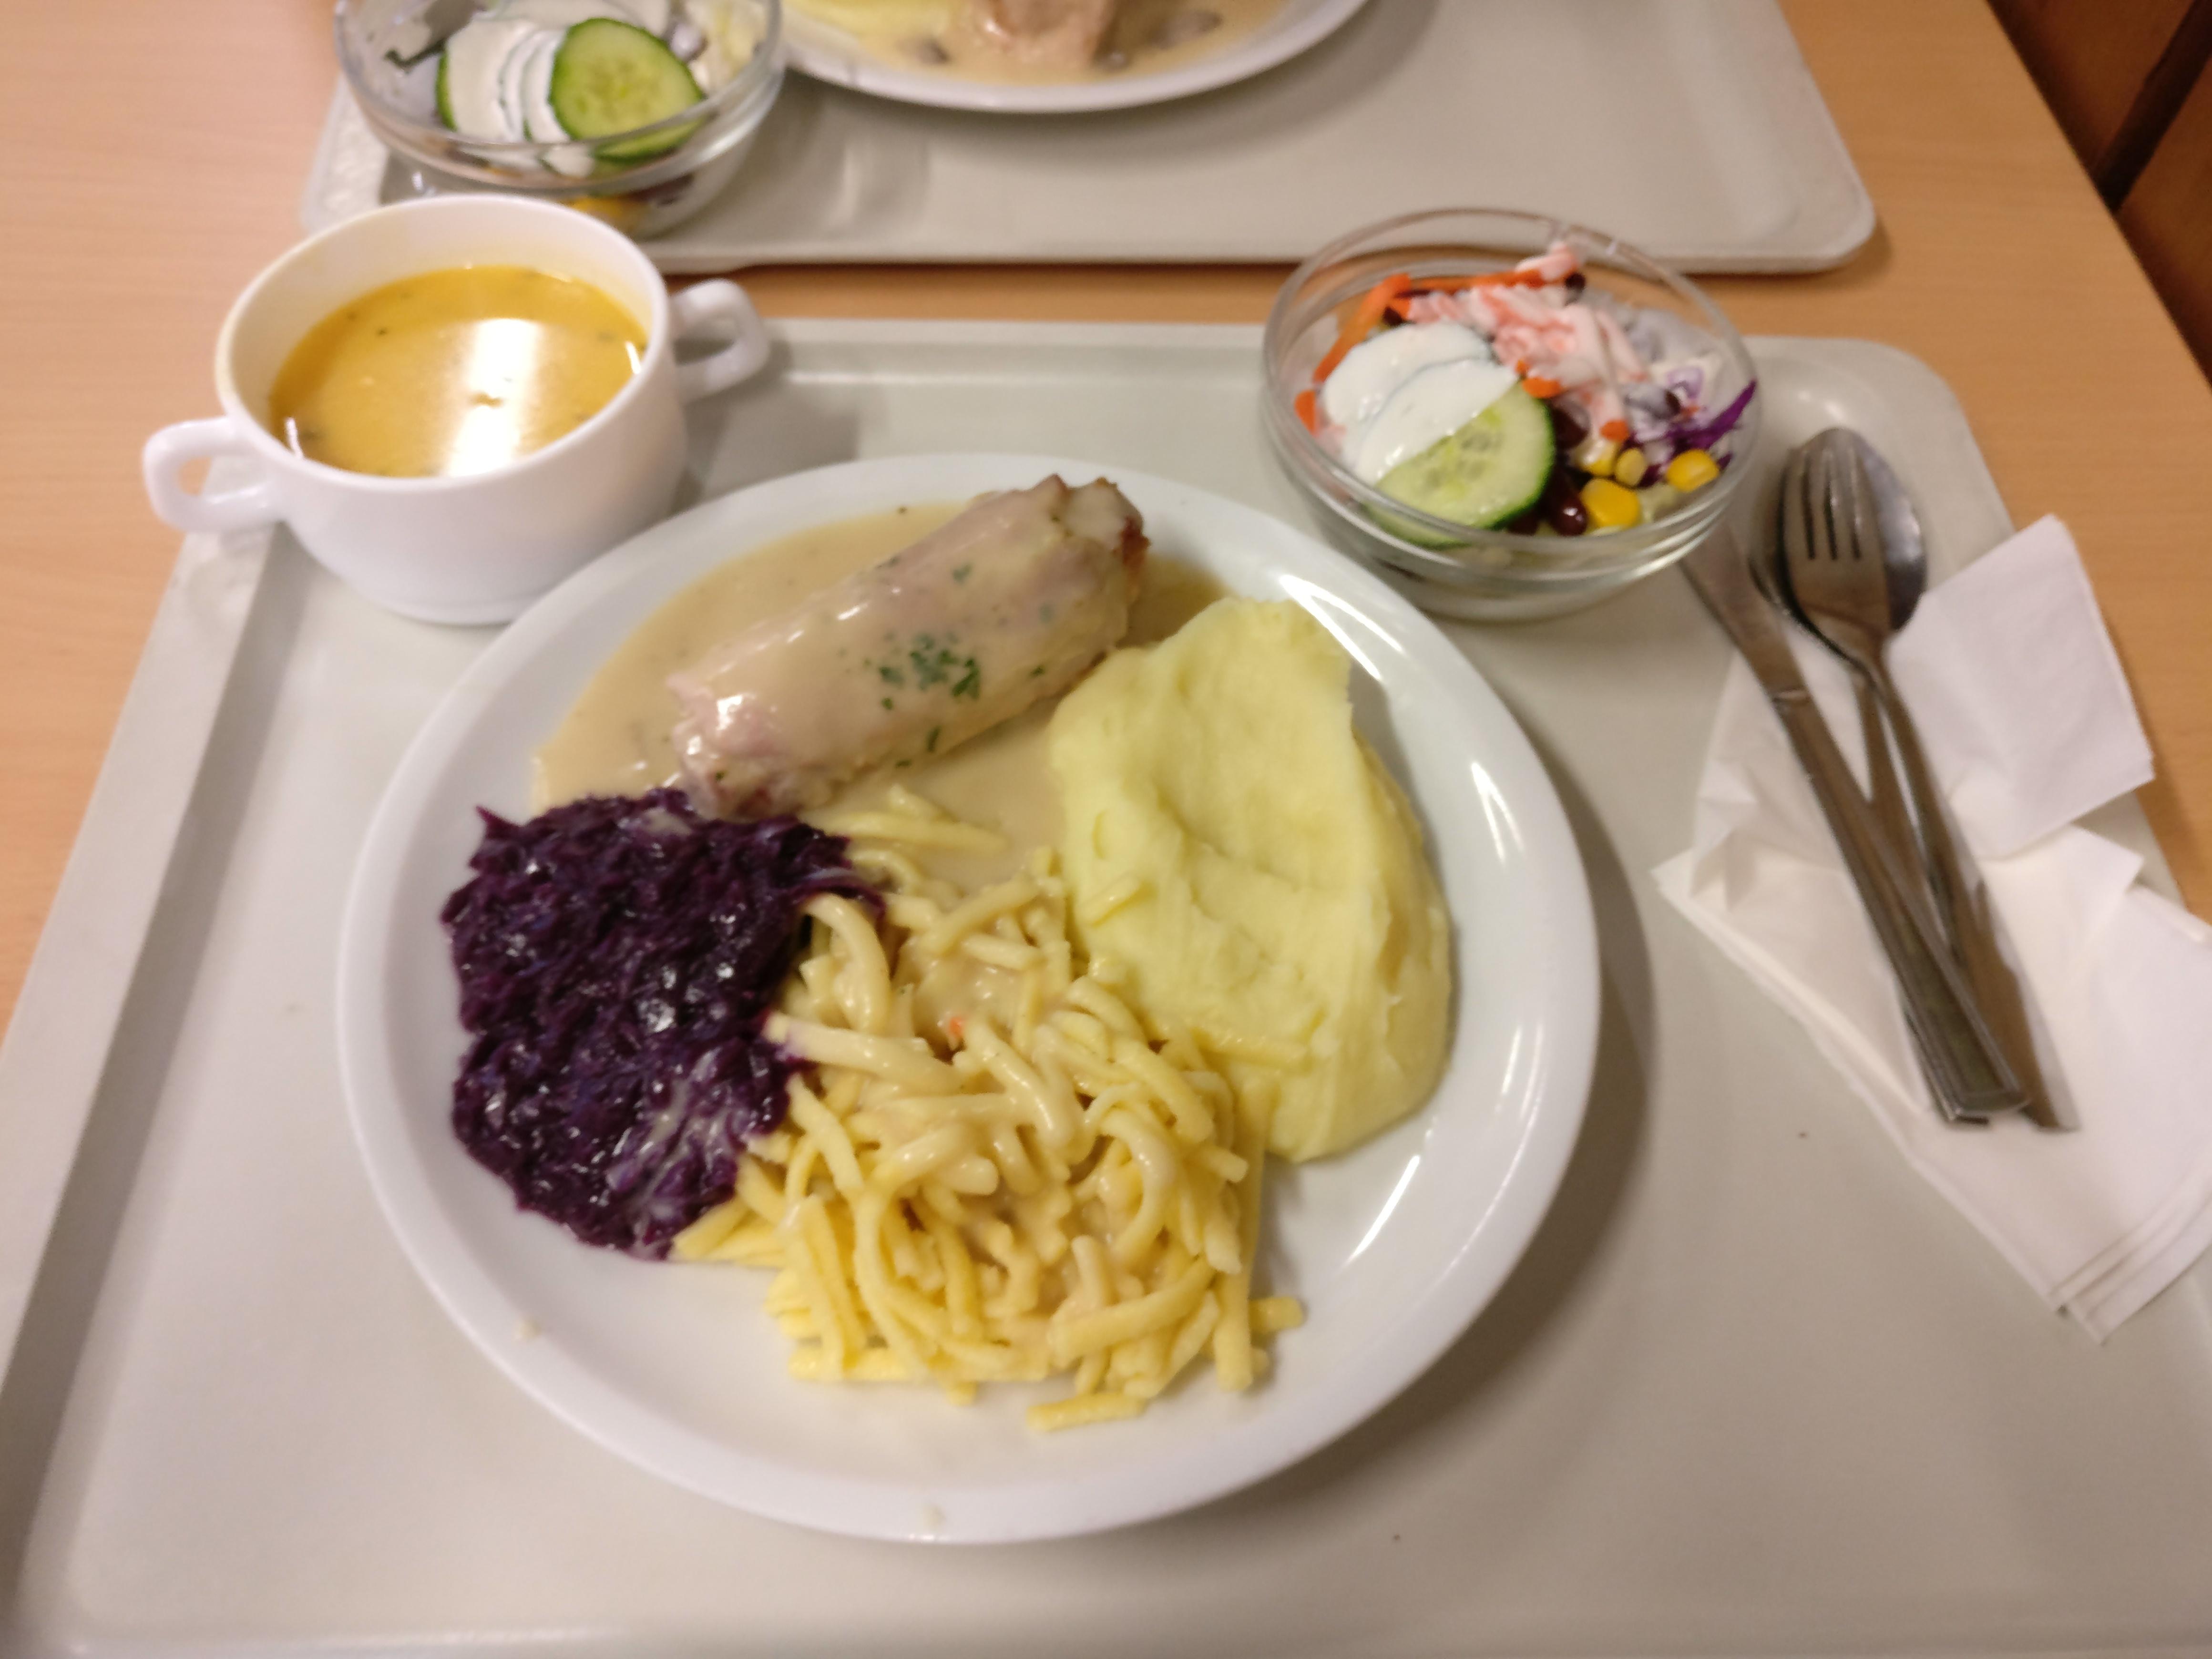 https://foodloader.net/nico_2017-02-15_roulade-kartoffelpuree-spaetzle-rotkraut-suppe-salat.jpg